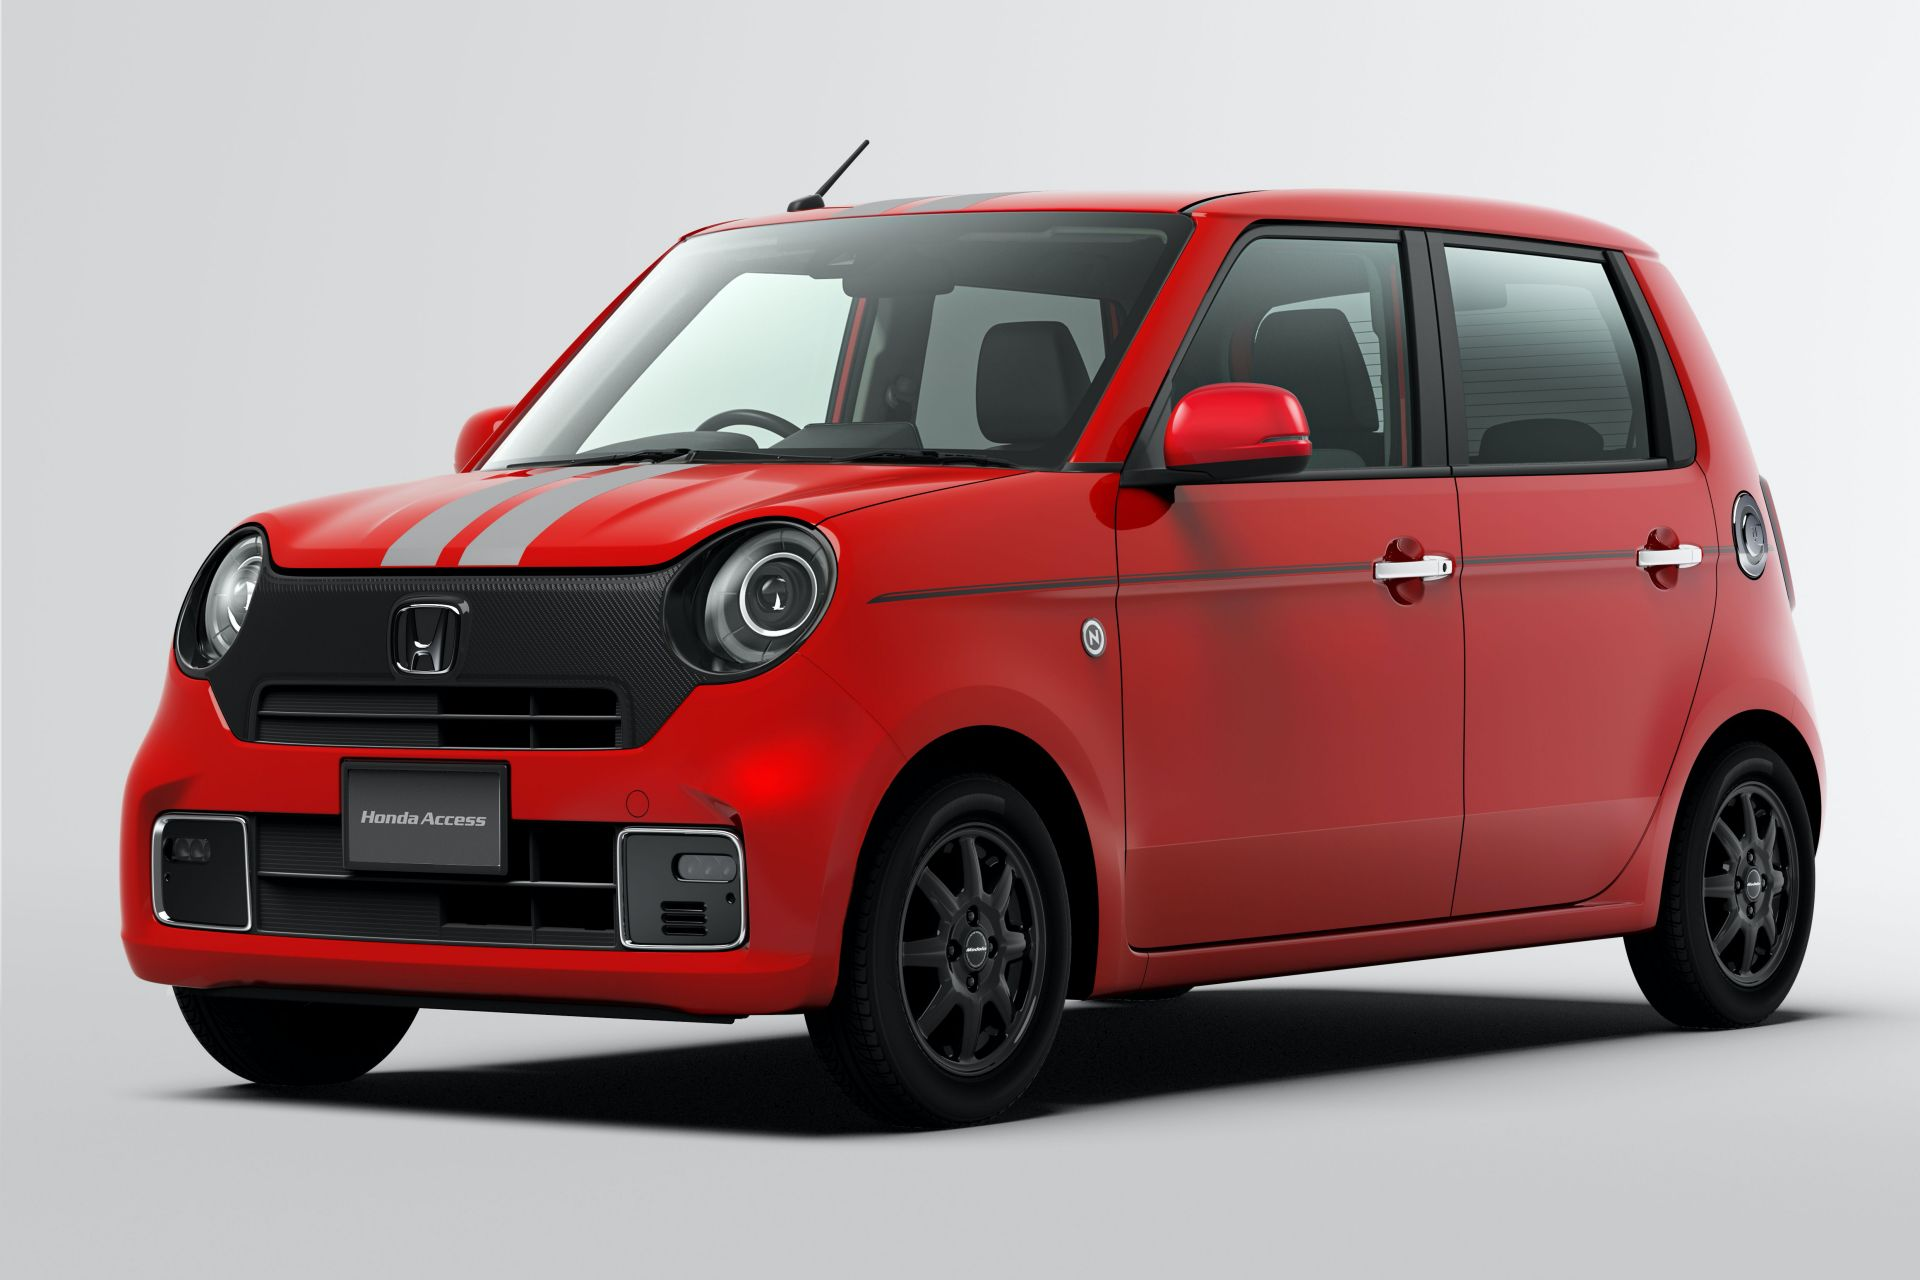 Honda-Access-for-2021-N-One-JDM-spec-3-1